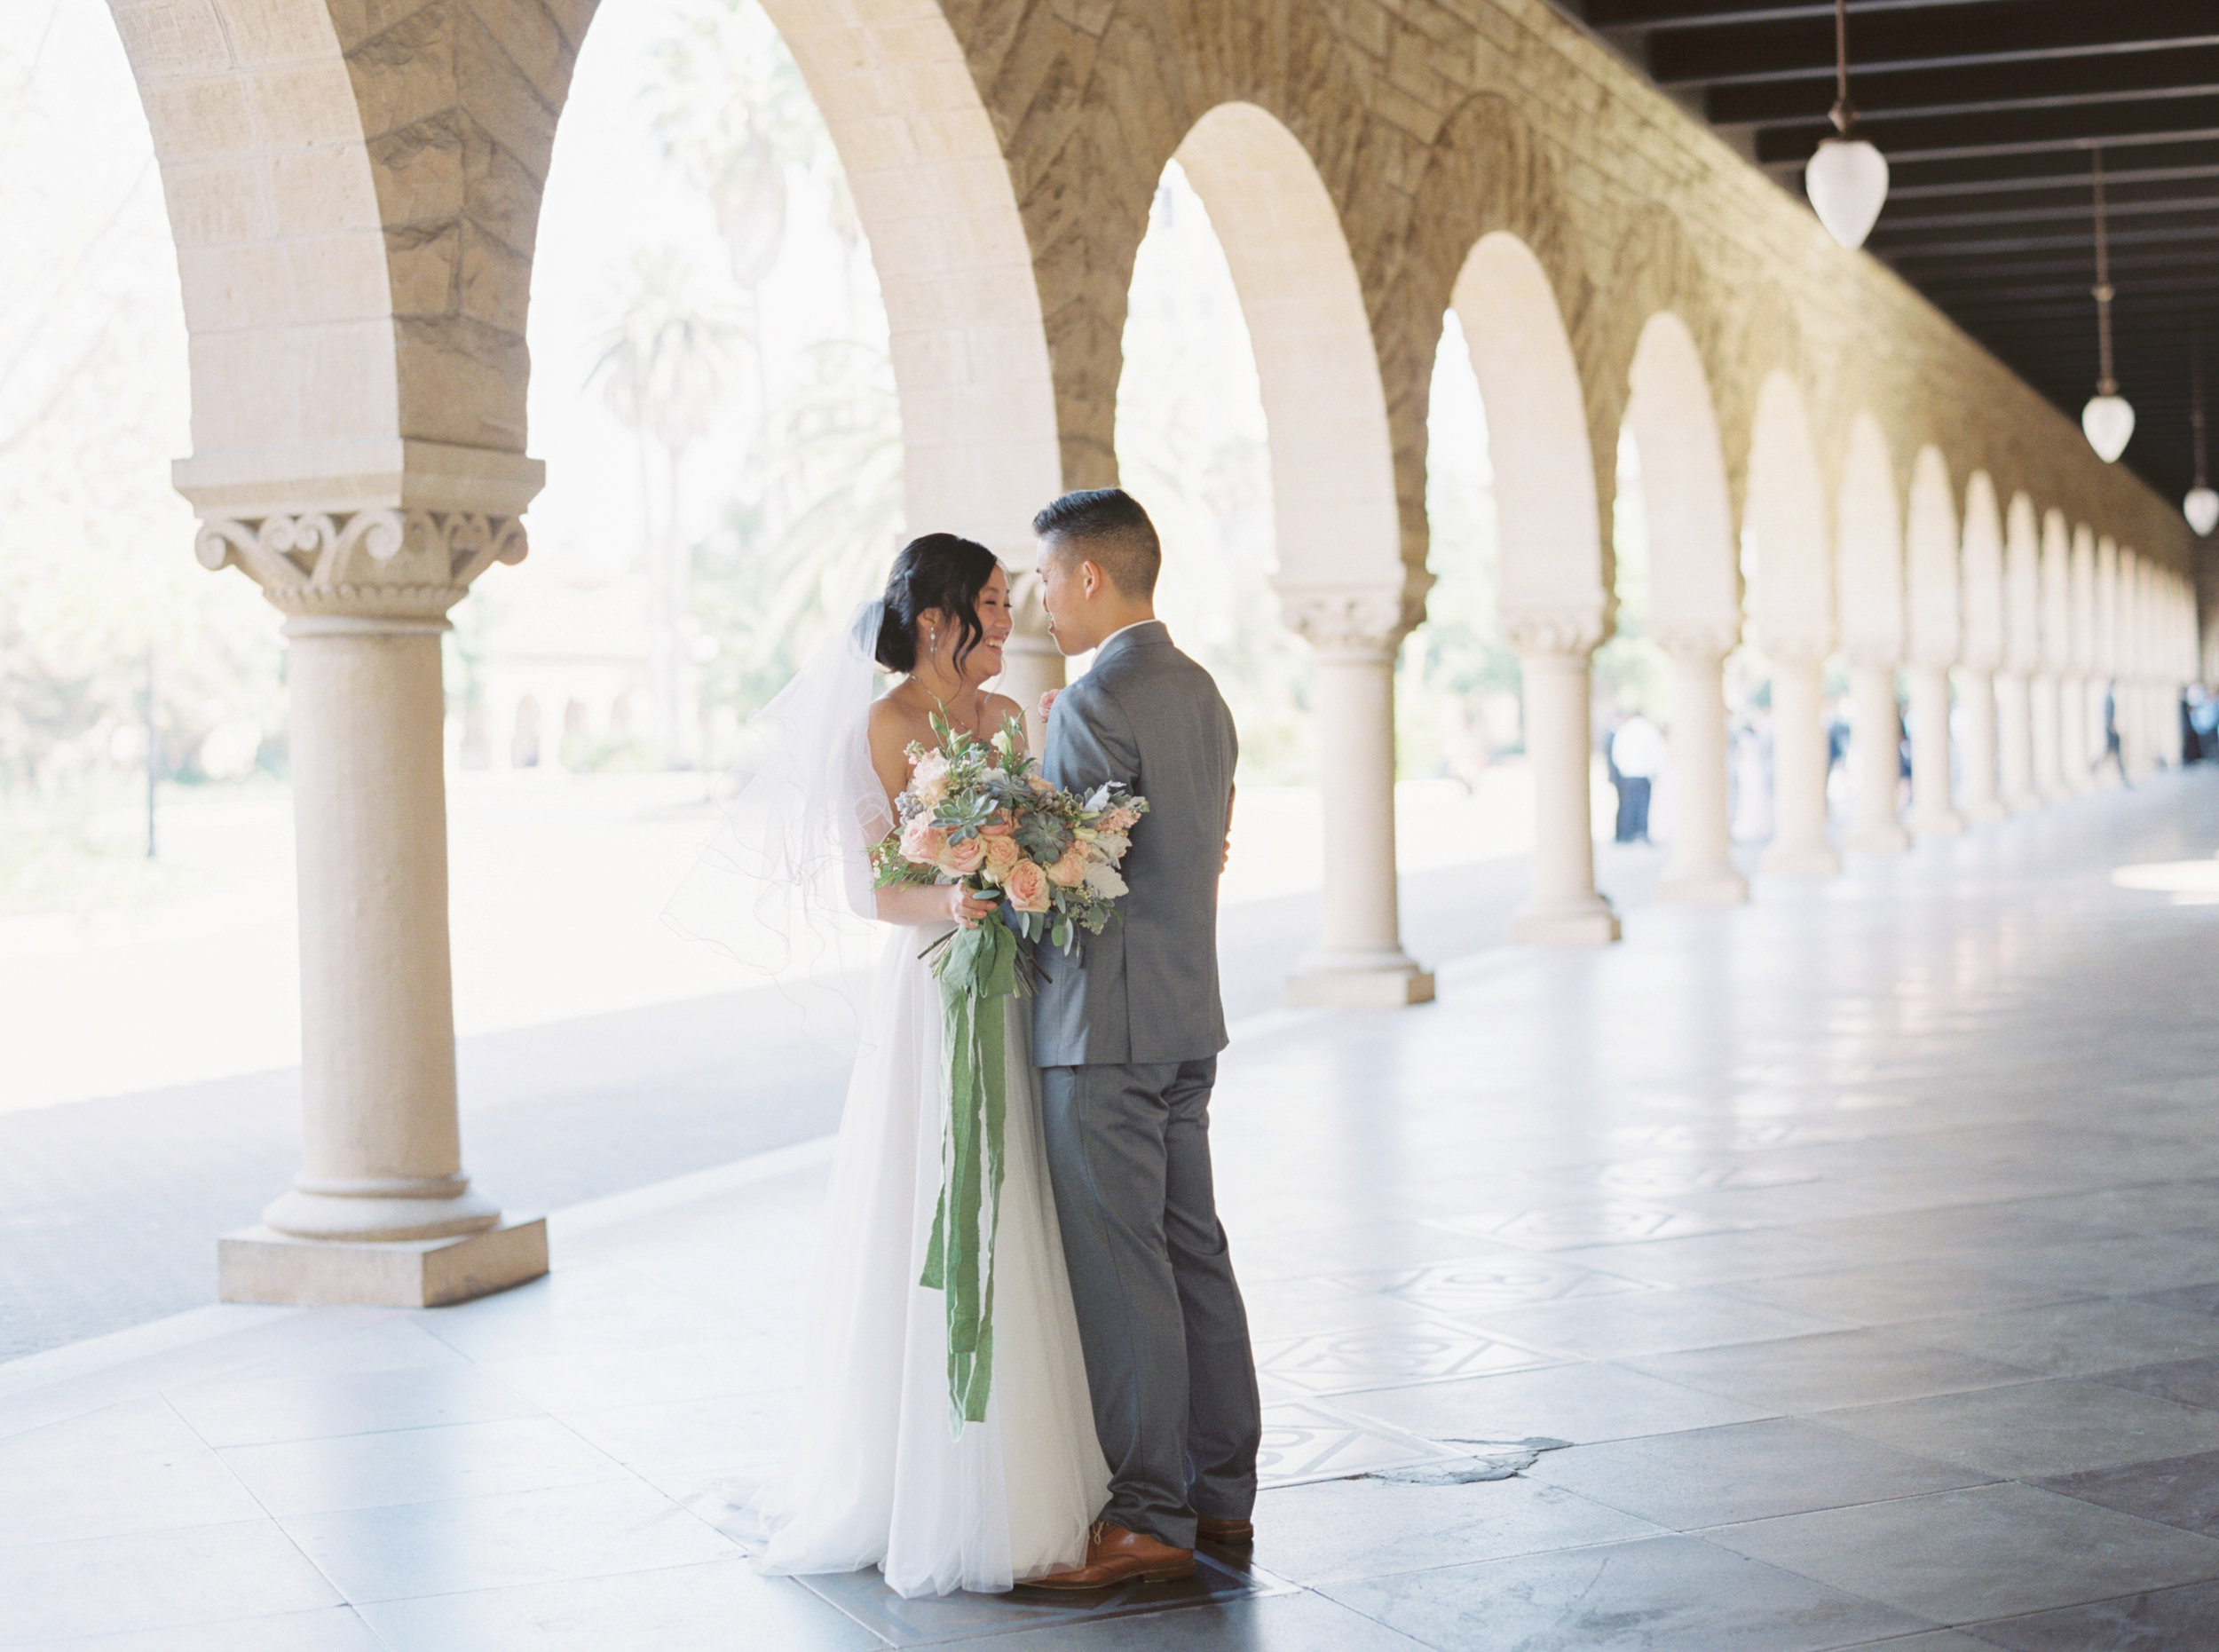 trynhphoto_wedding_photography_Standford_PaloAlto_SF_BayArea_Destination_OC_HA-39.jpg